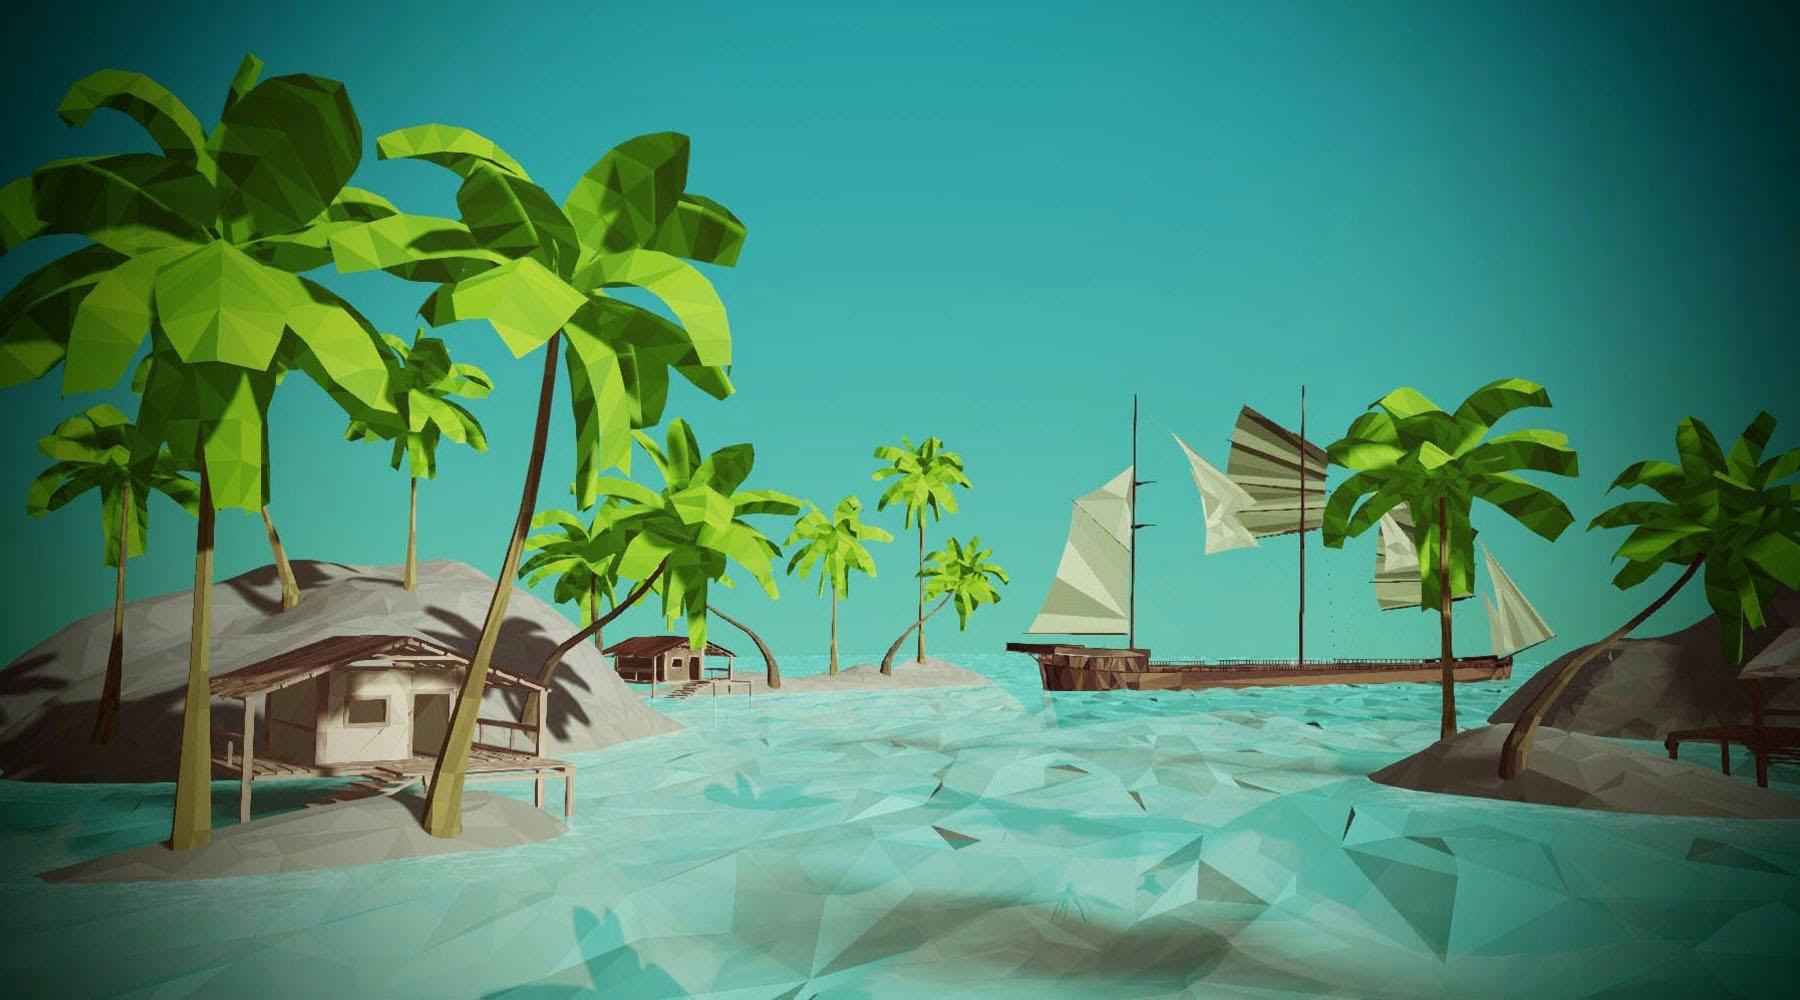 Tropical planet